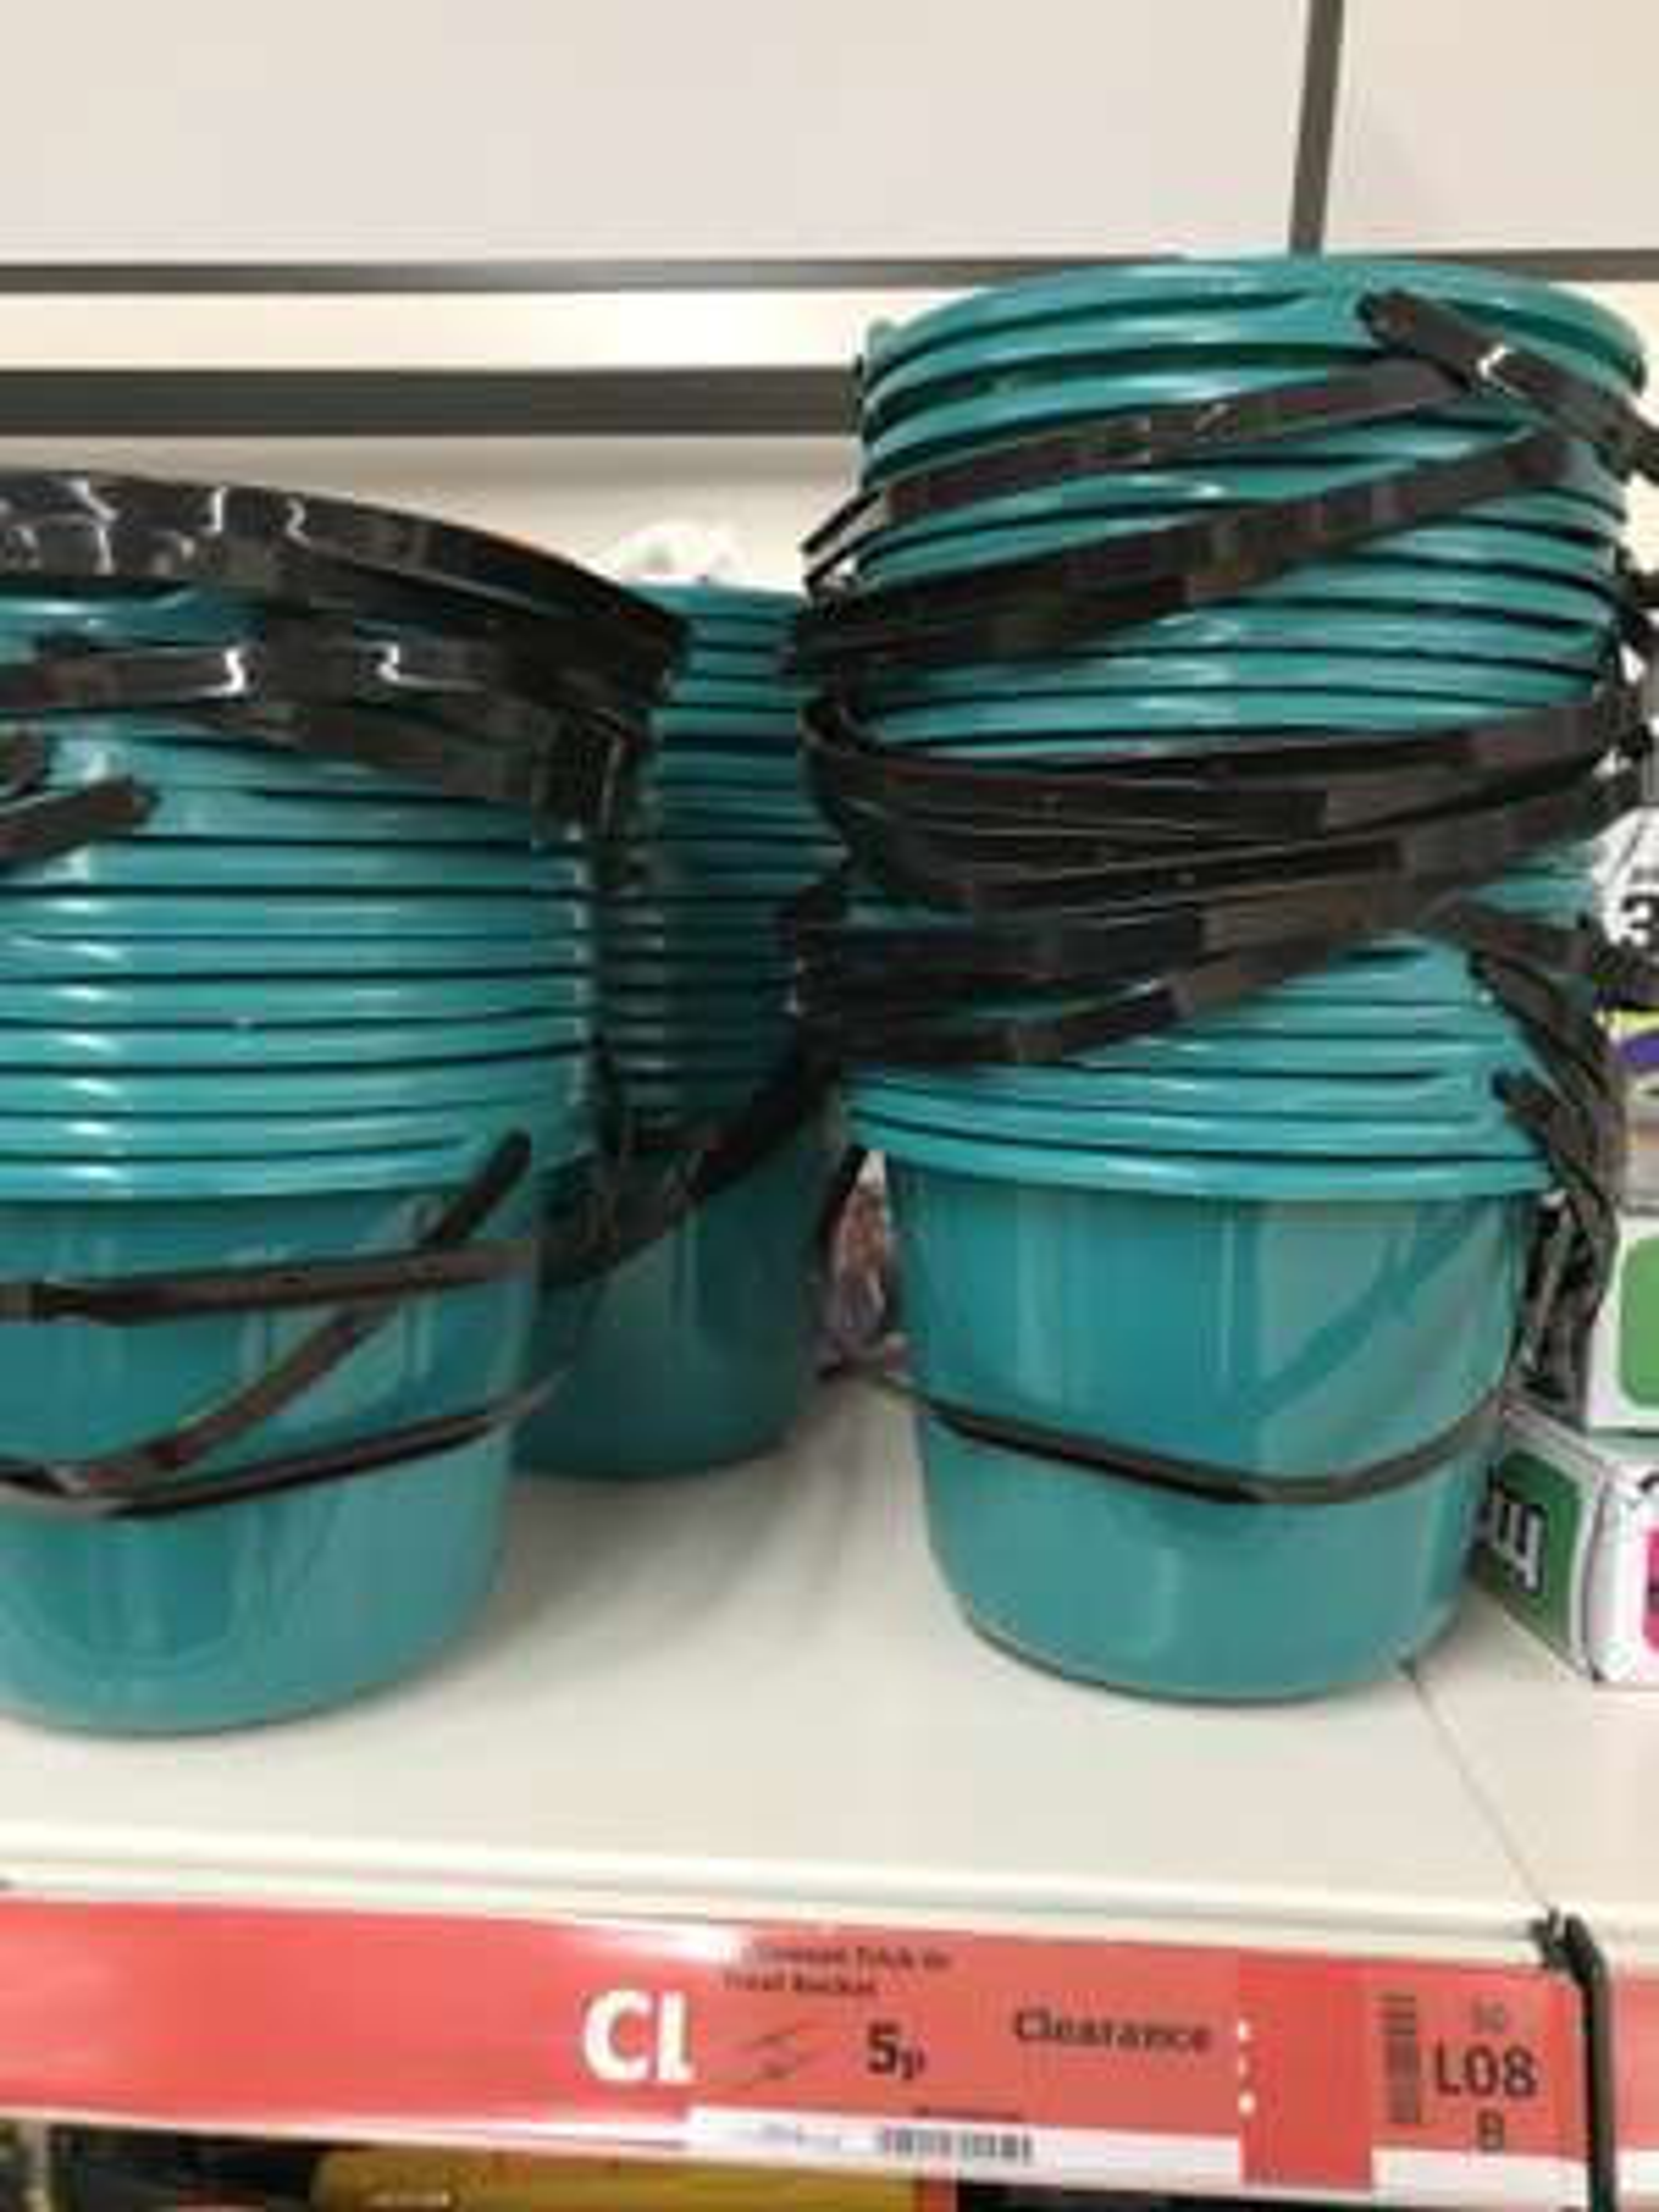 Halloween bucket 5p Turquoise or Orange (Merton Store) @ Sainsbury's